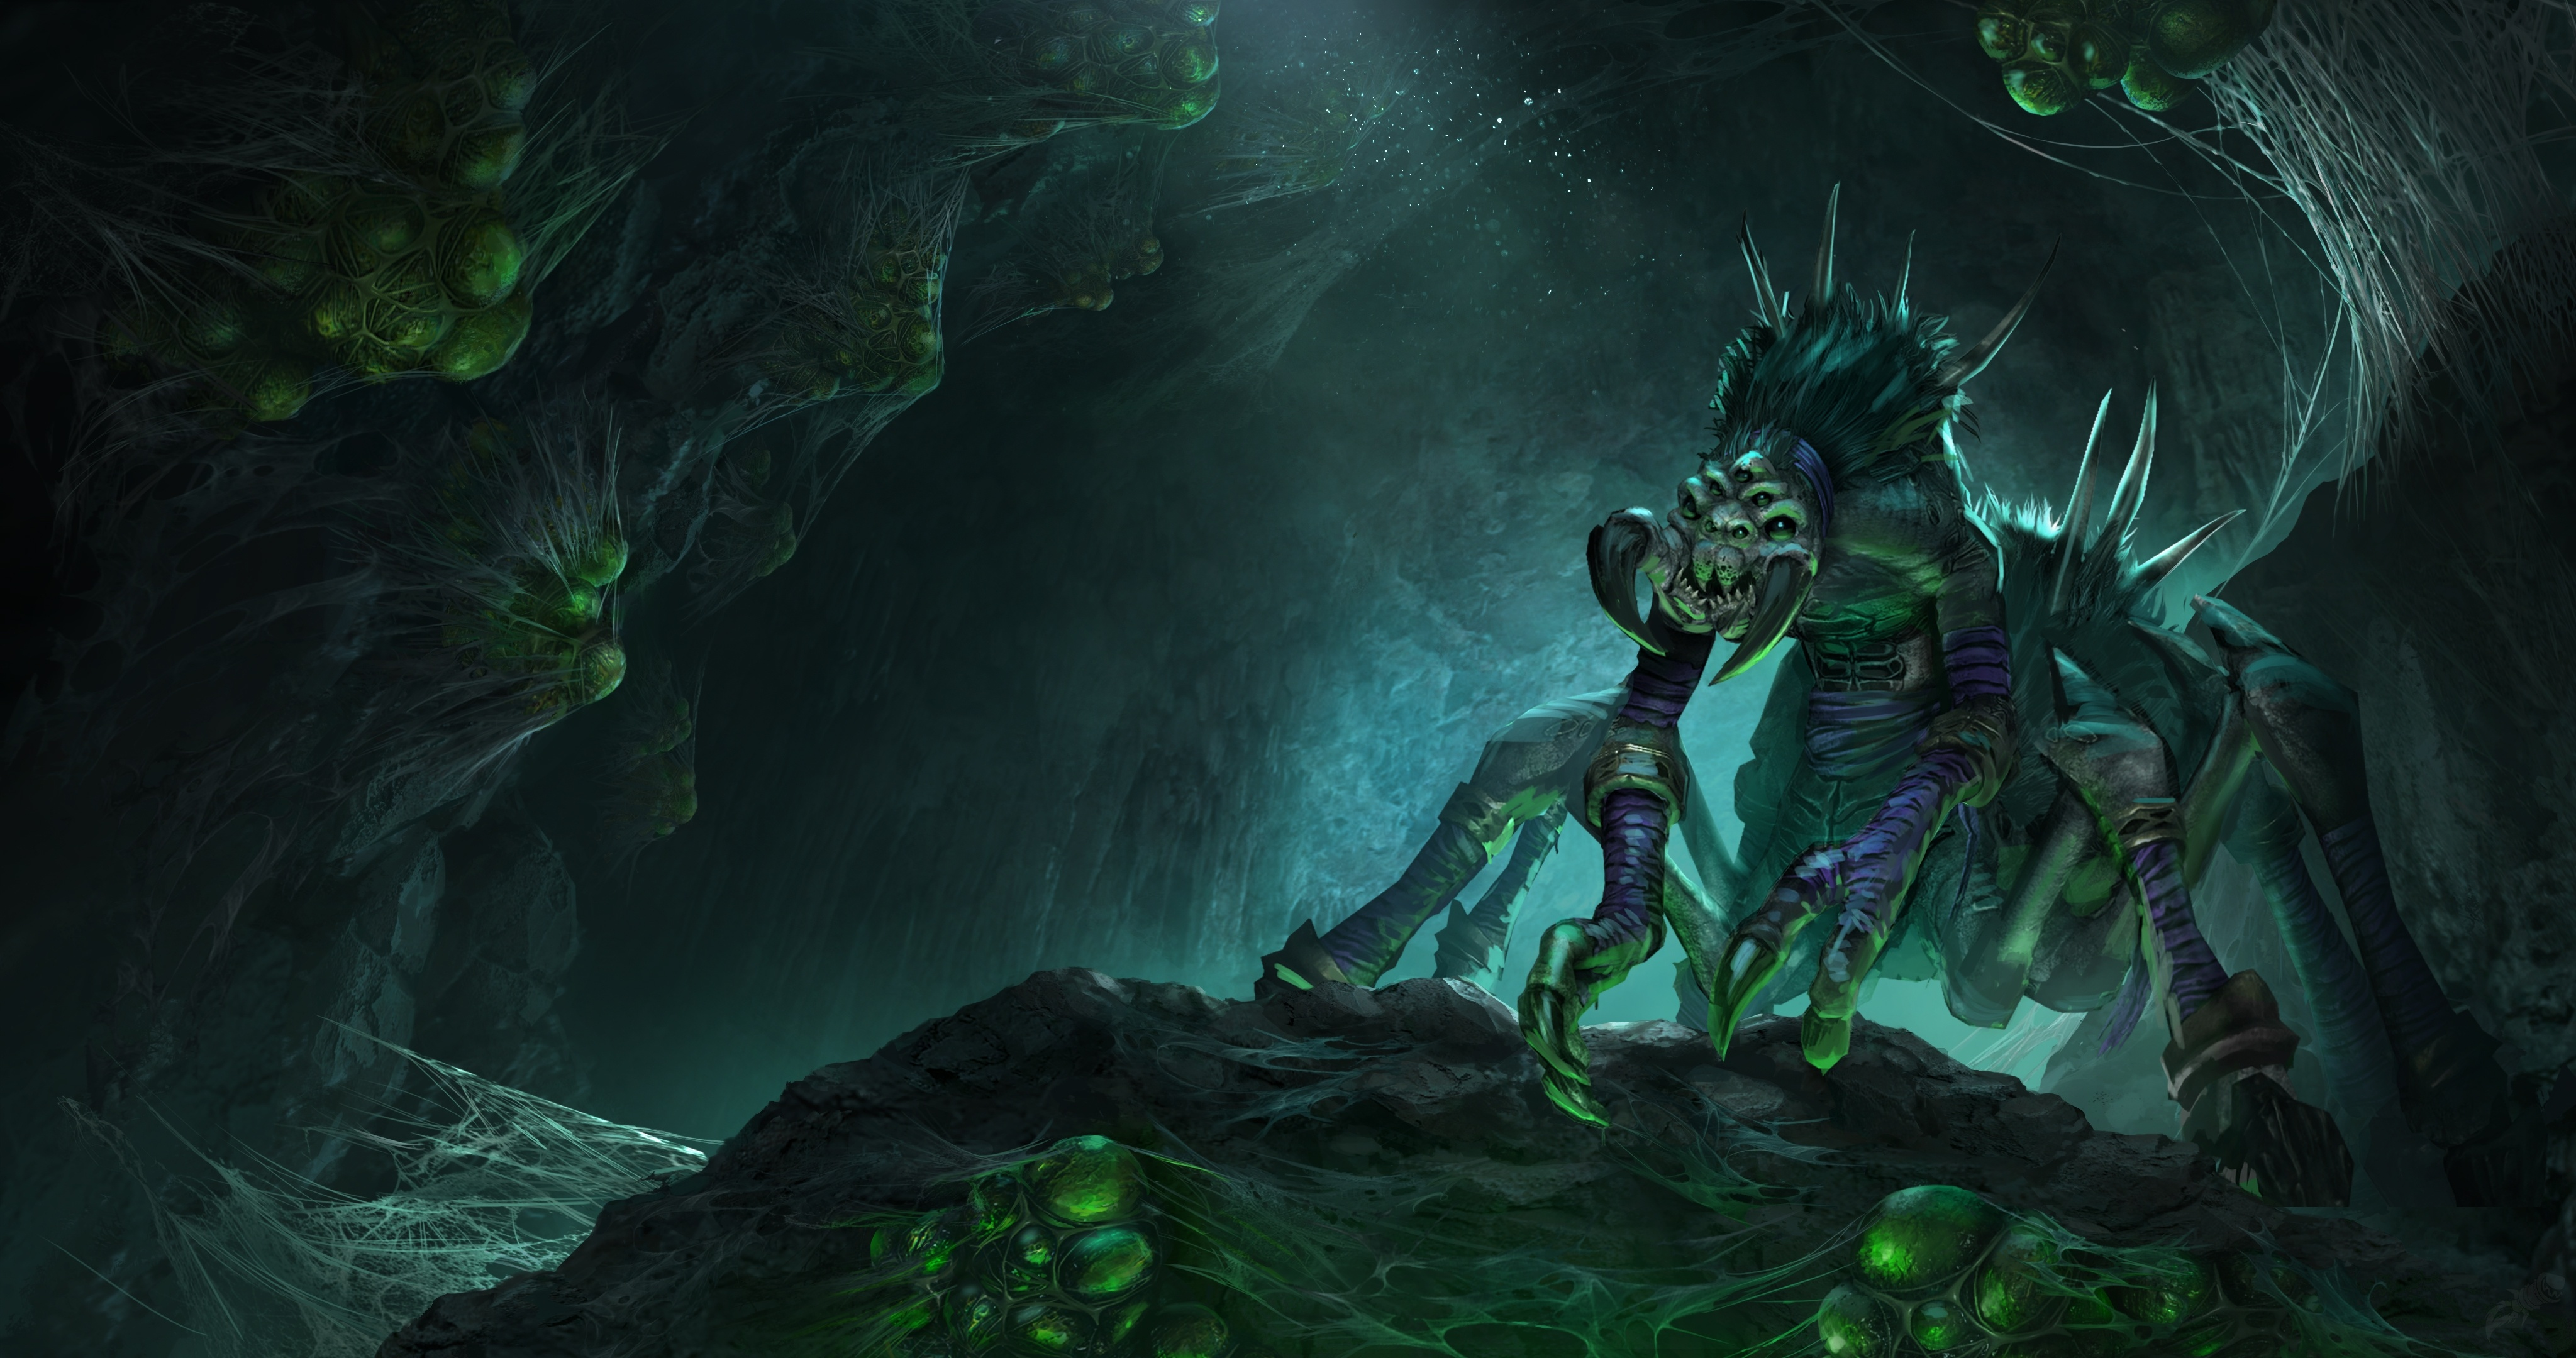 World of Warcraft Classic, World of Warcraft, Warcraft, Blizzard Entertainment